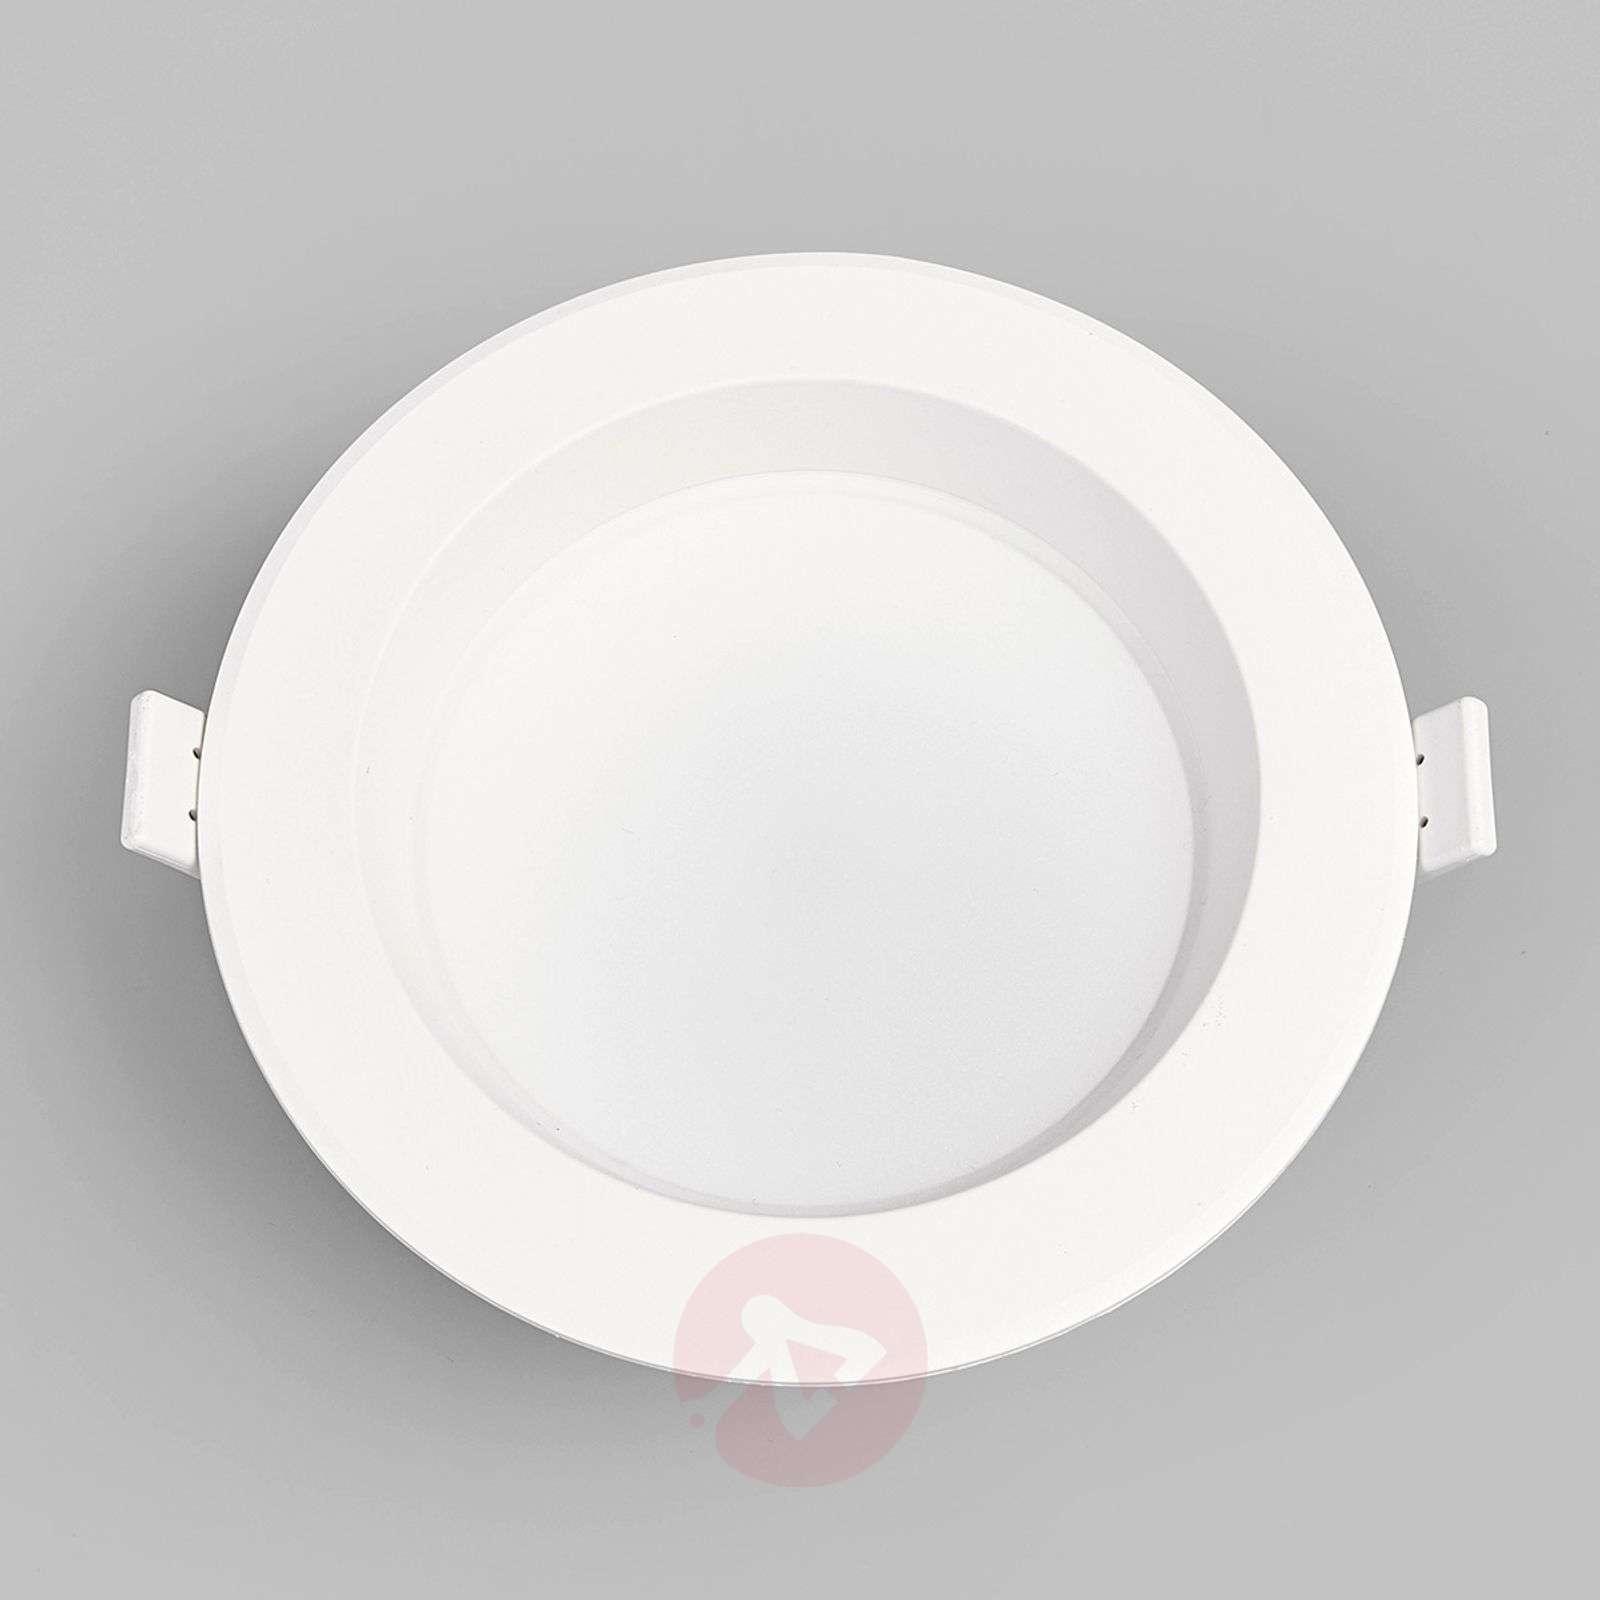 Bright LED recessed light Arian, 14.5 cm, 12.5 W-9978010-03